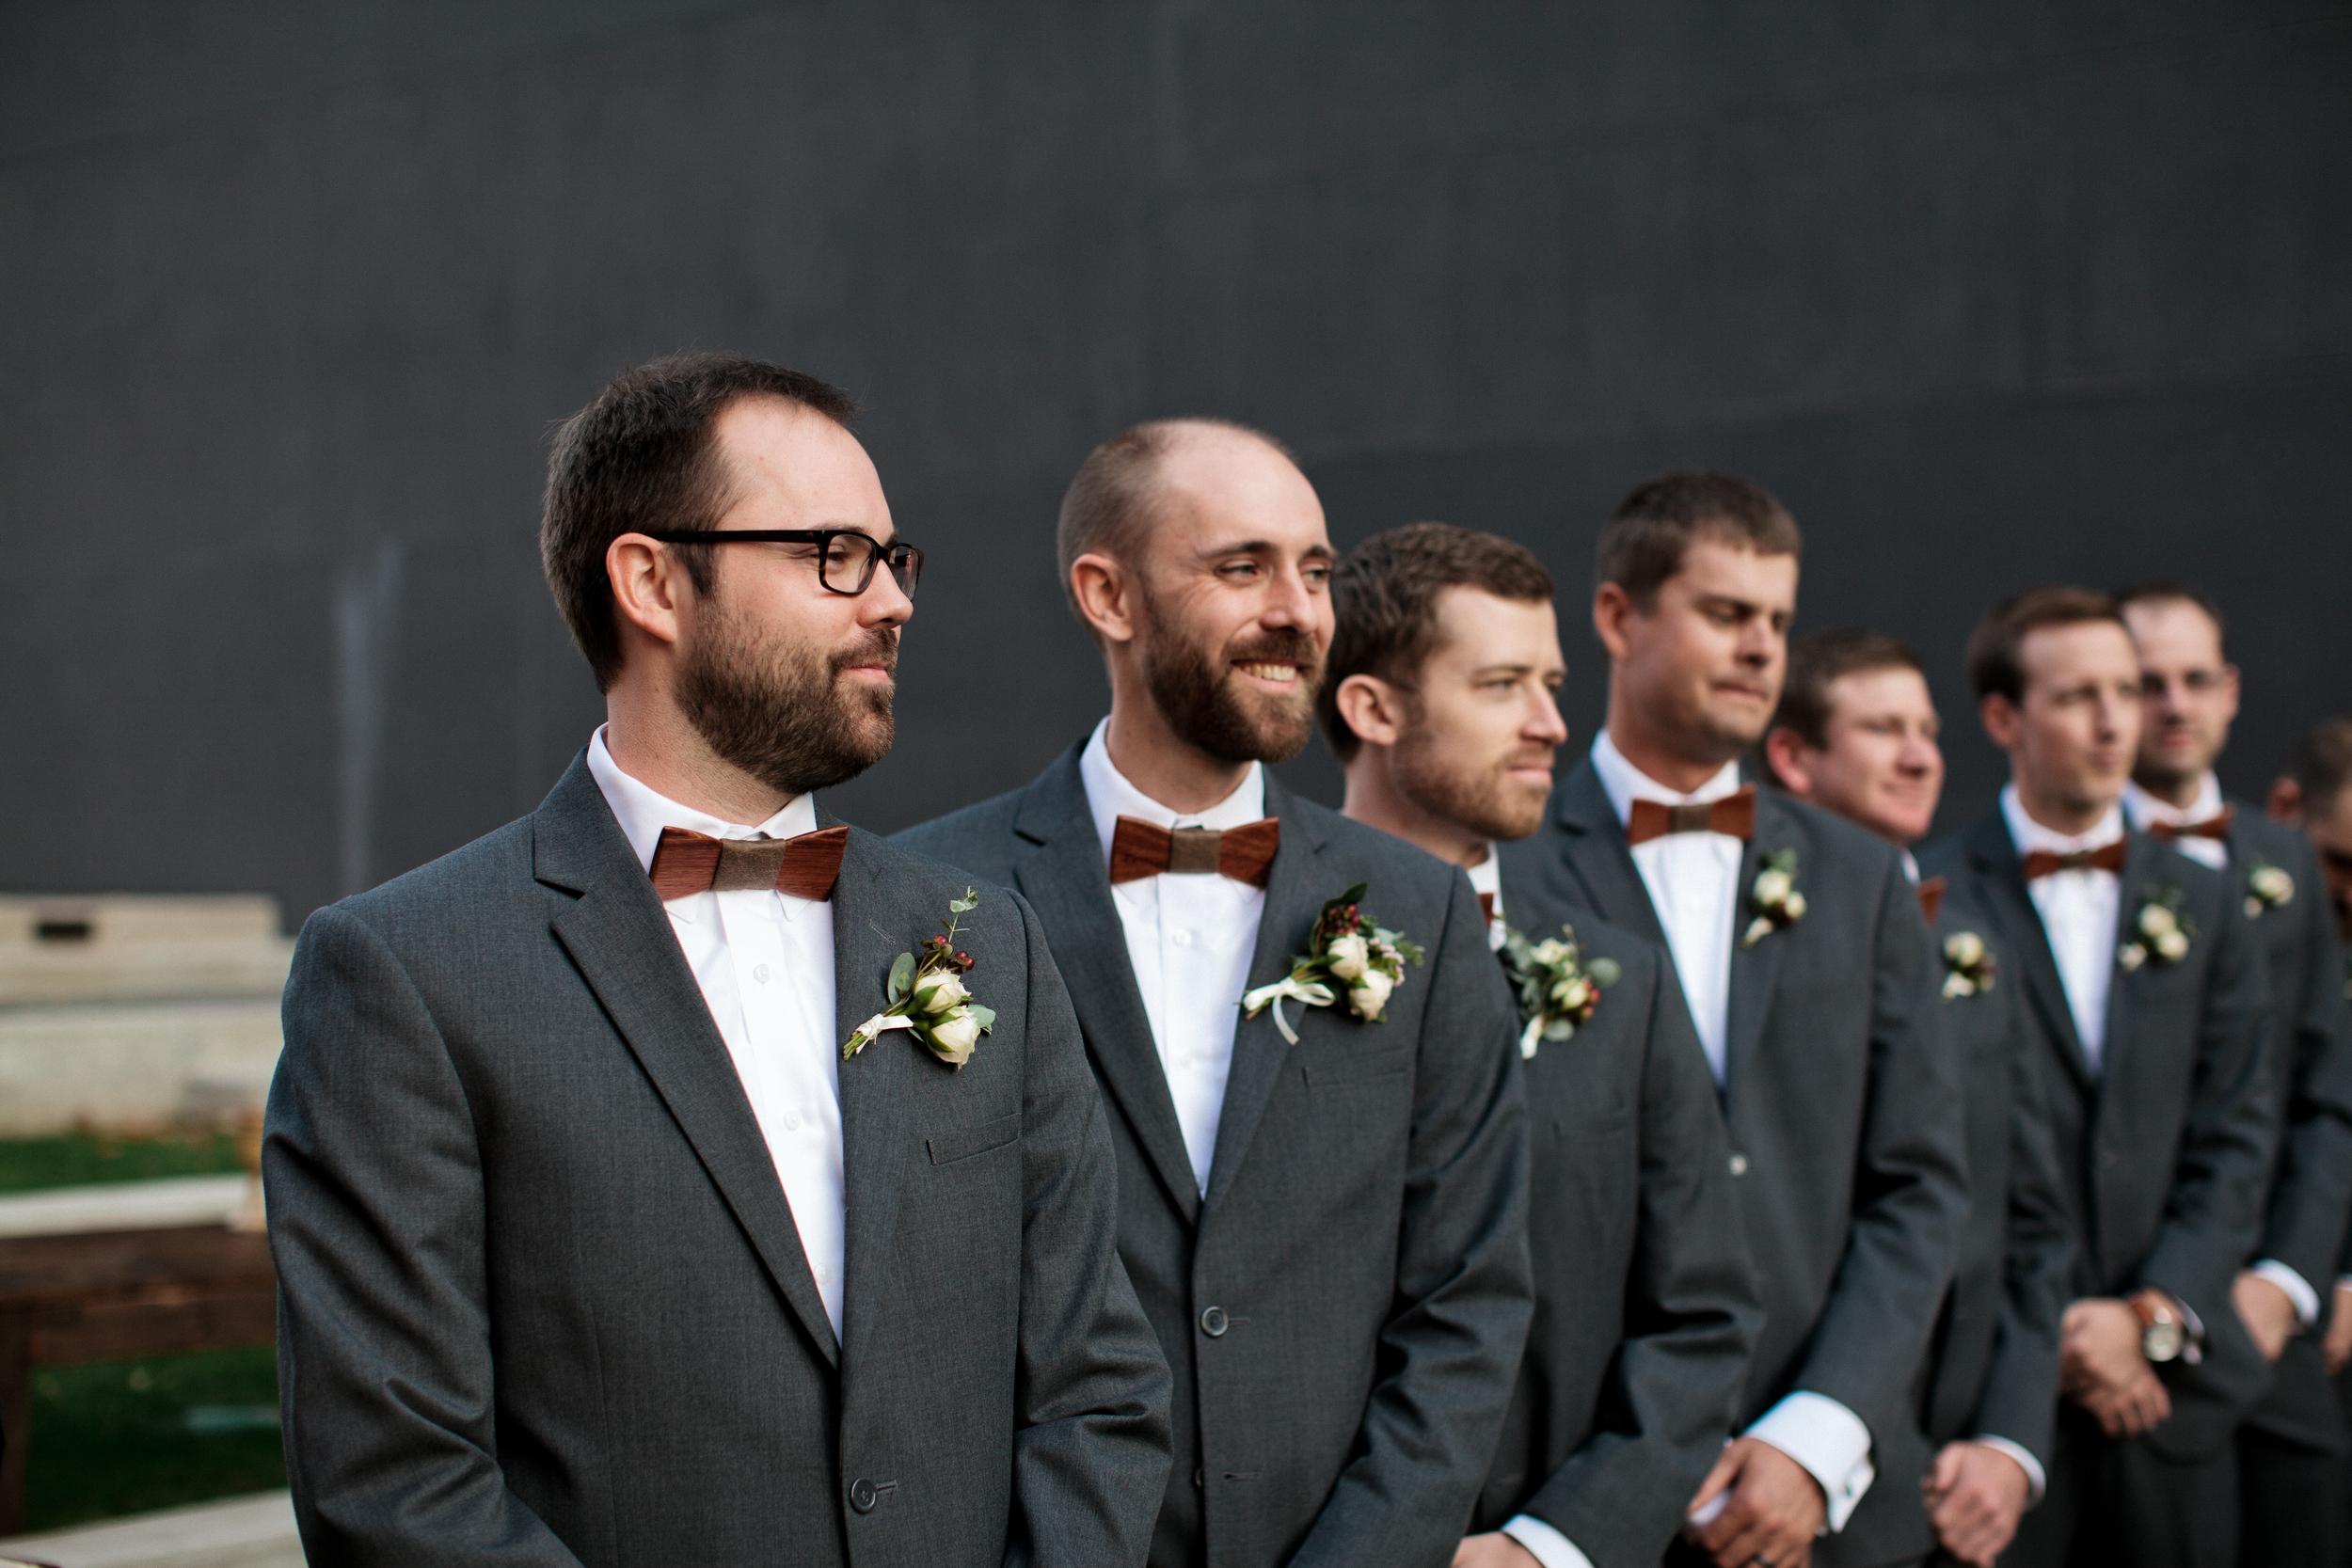 tulsa_oklahoma_wedding-188.jpg